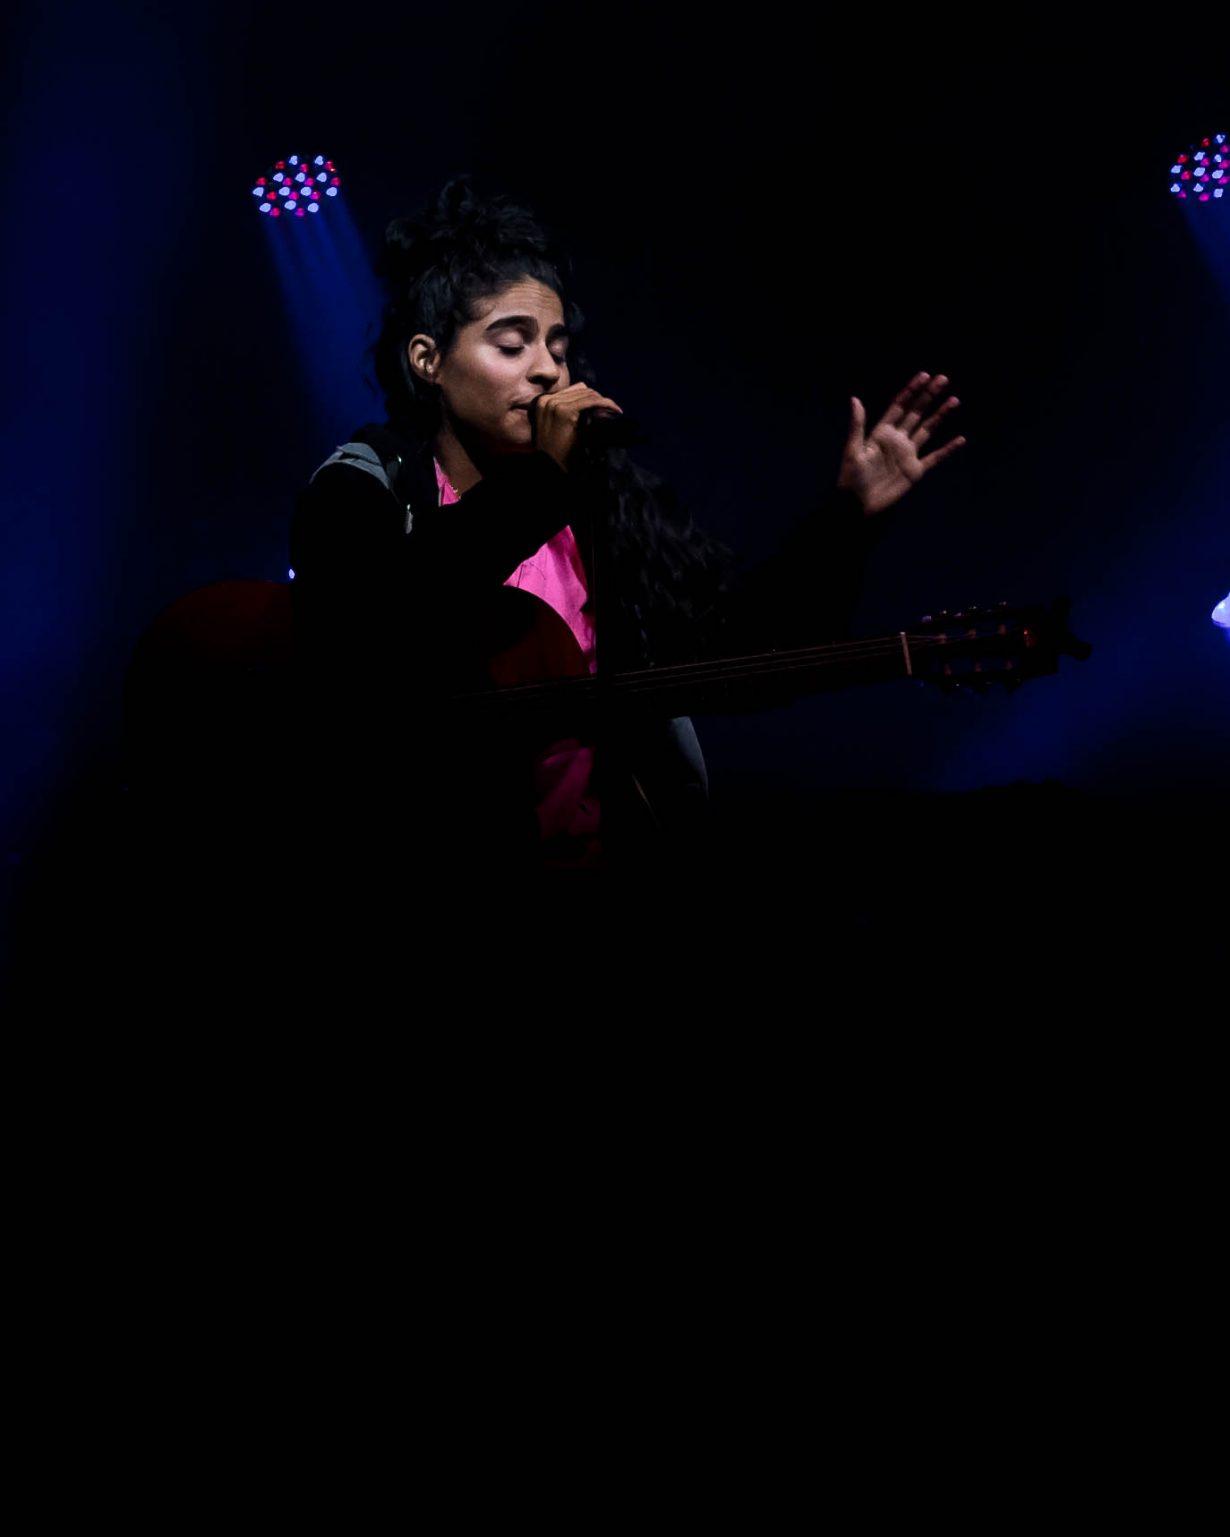 Jessie Reyez at Schubas. Photo Kevin Baker 14 1230x1537 Jessie Reyez Kiddo Tour Was An Intimate Vibe at Schubas